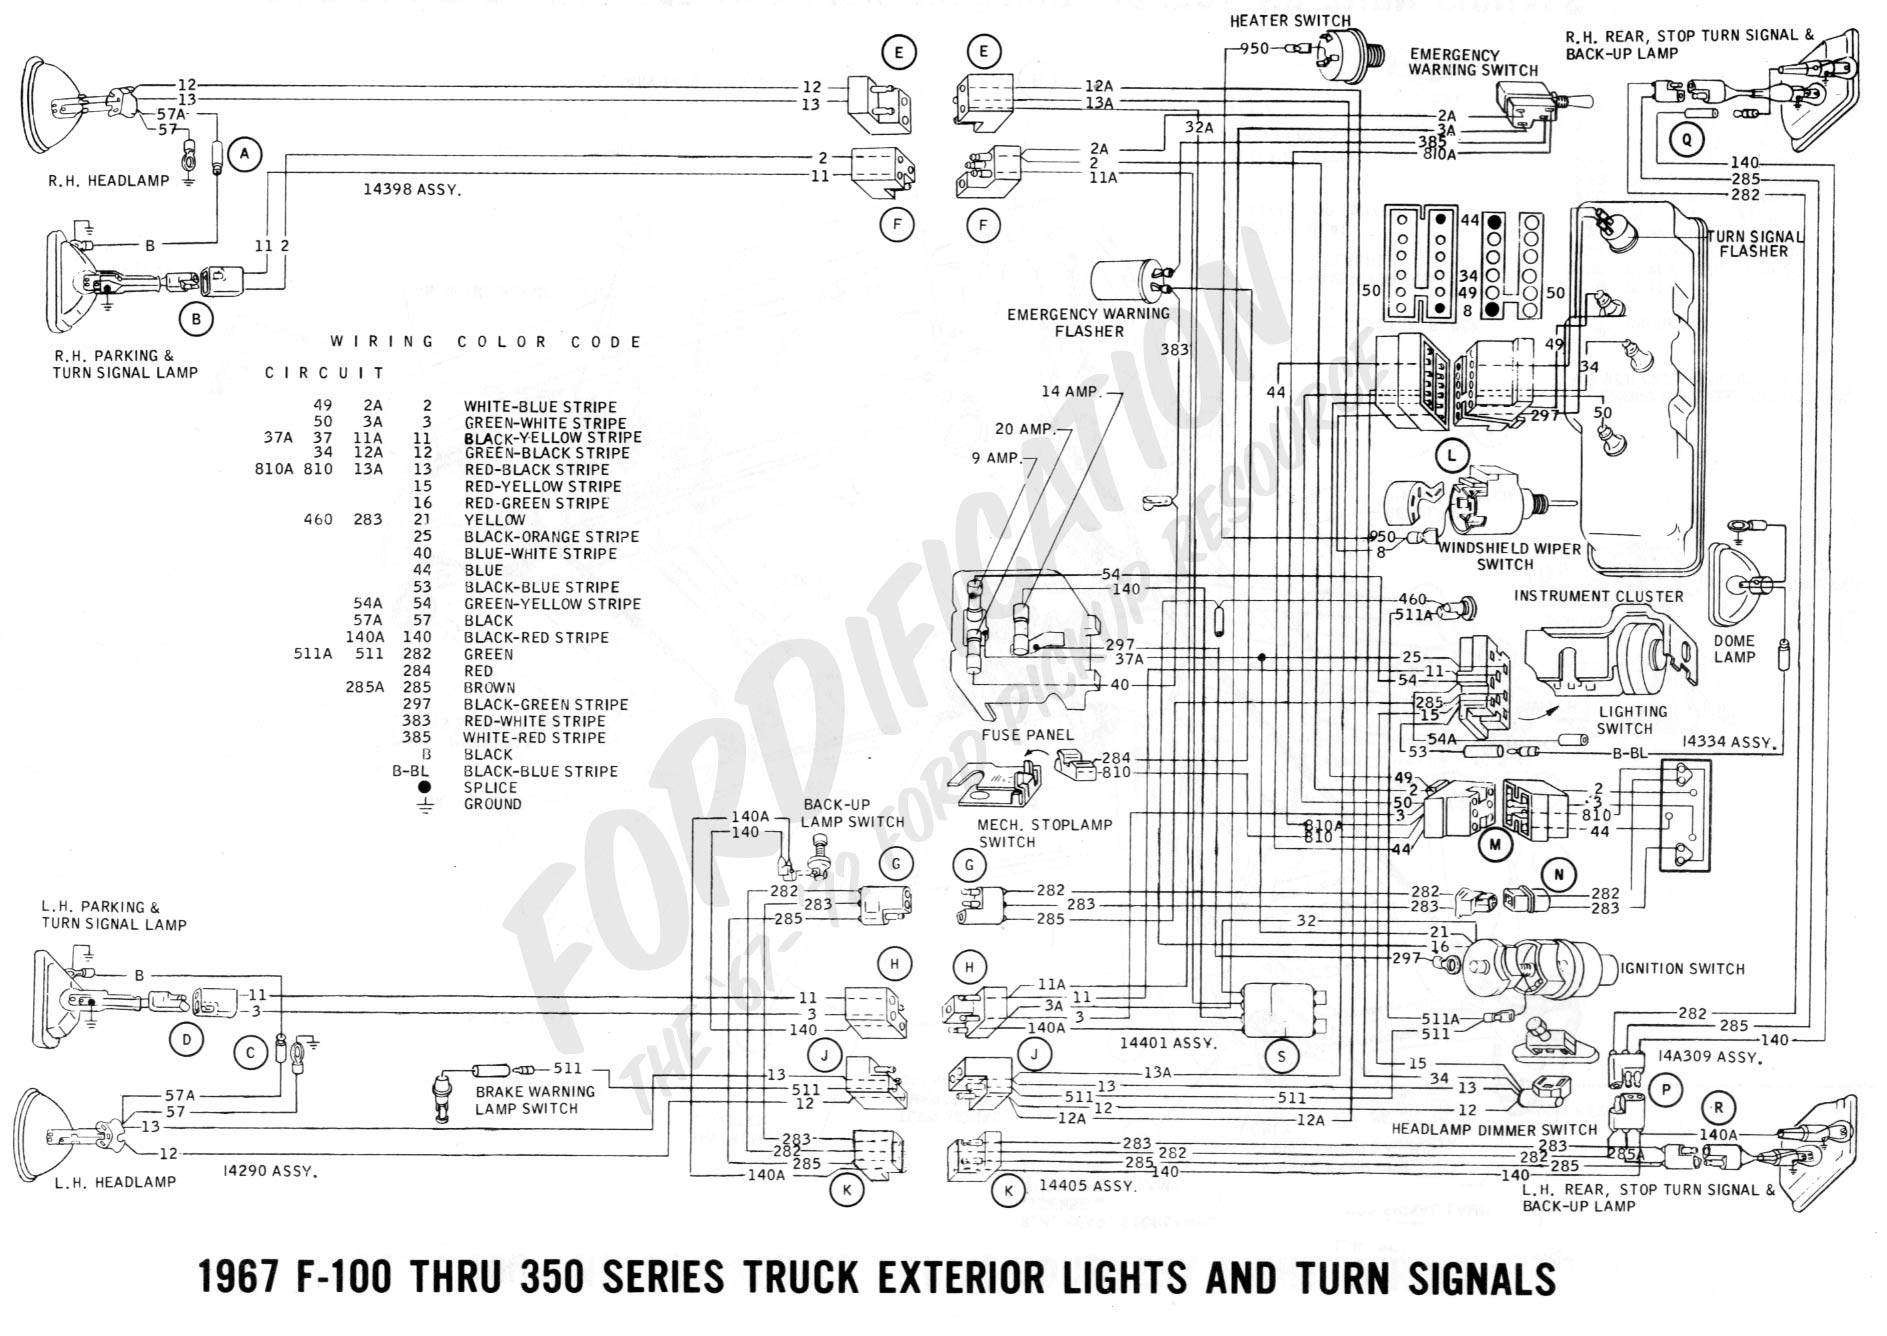 tail light wiring diagram ford f150 77 ford f250 wiring diagram rh detoxicrecenze com 1958 Ford Truck Wiring Diagram 1958 Ford Truck Wiring Diagram